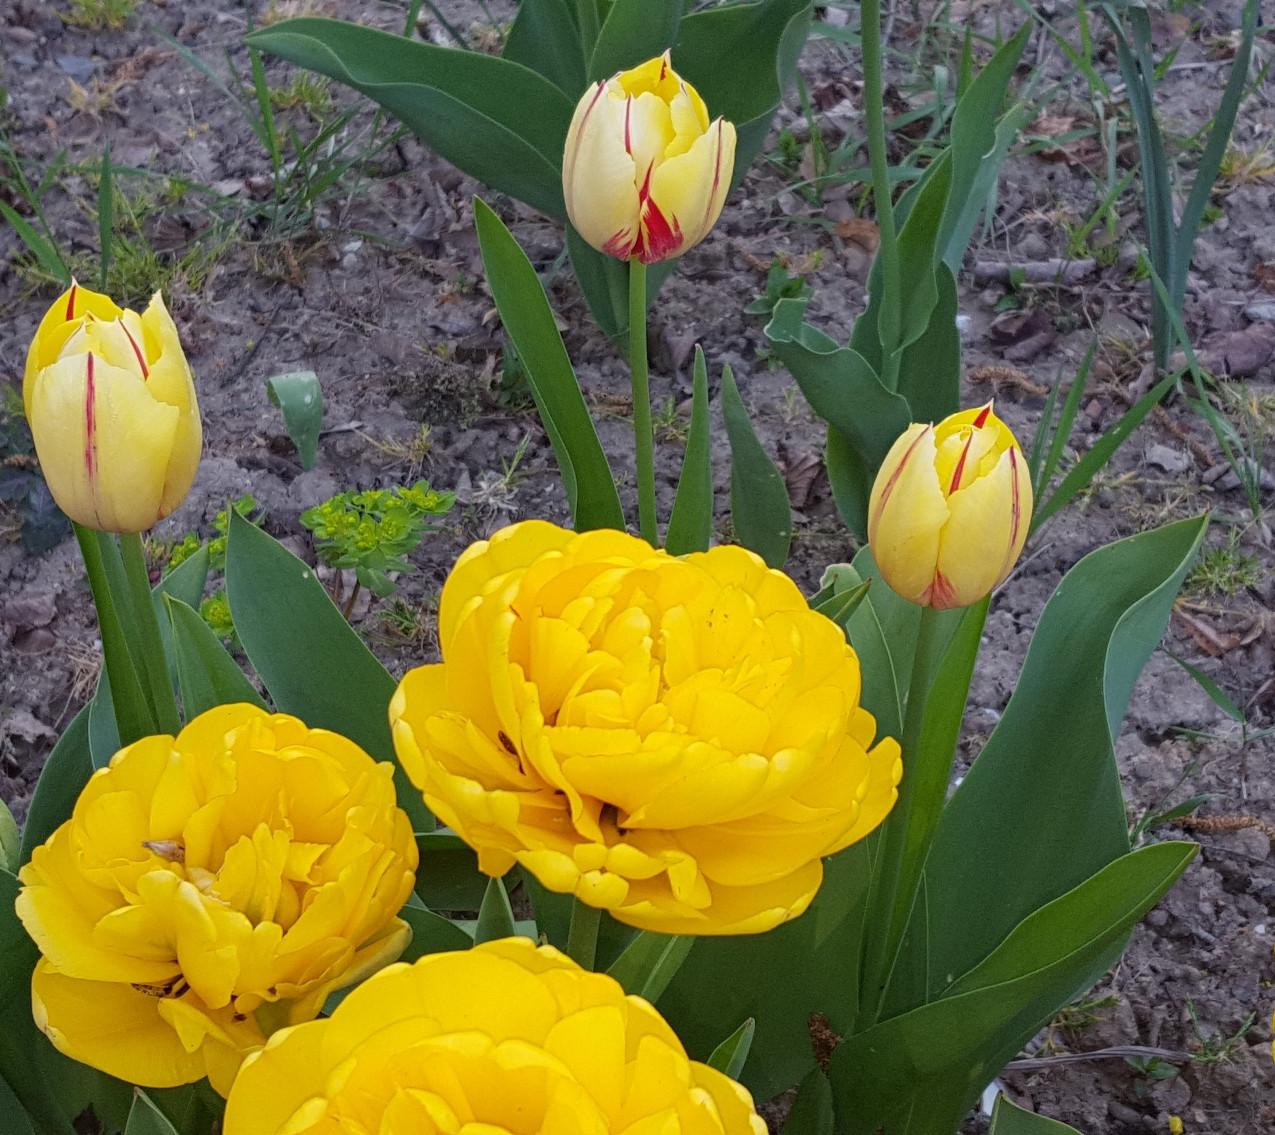 Zahrada-jaro-2020-Plnokvete tulipany